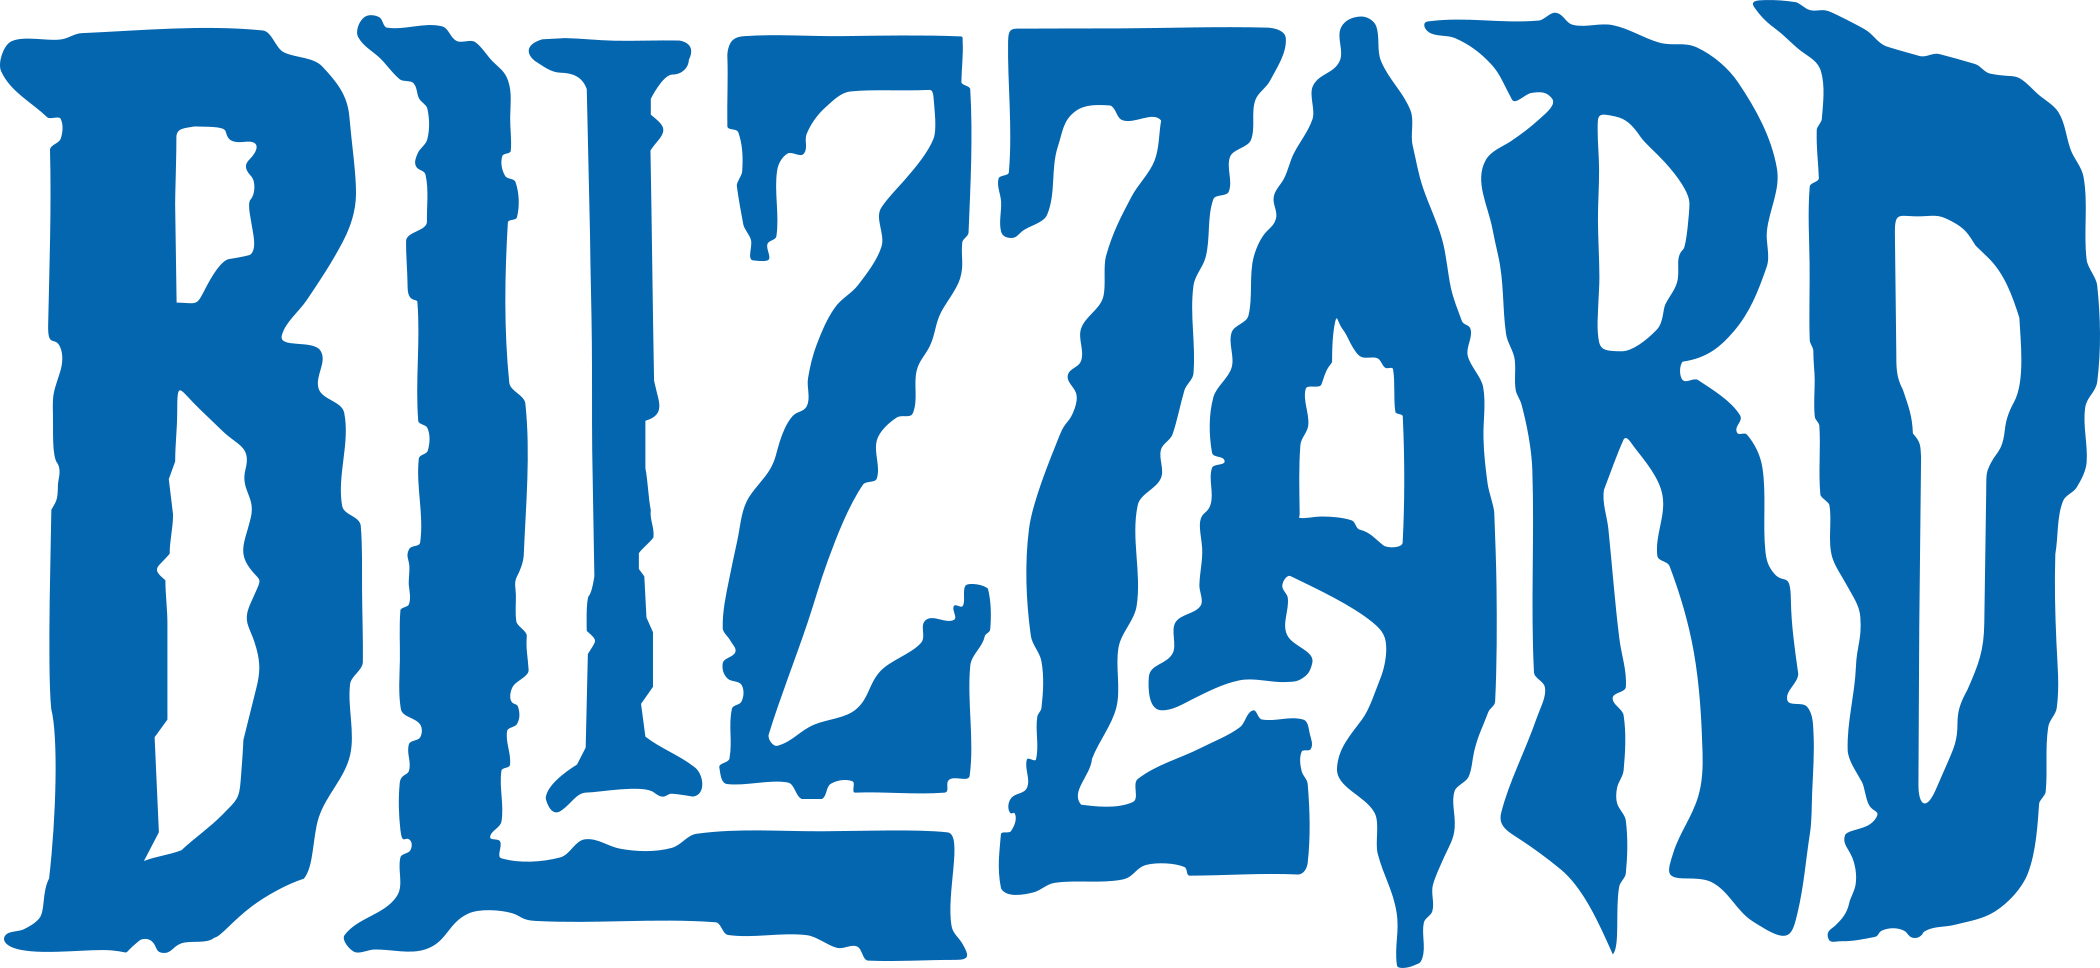 blizzard logo 3 - Blizzard Entertainment Logo